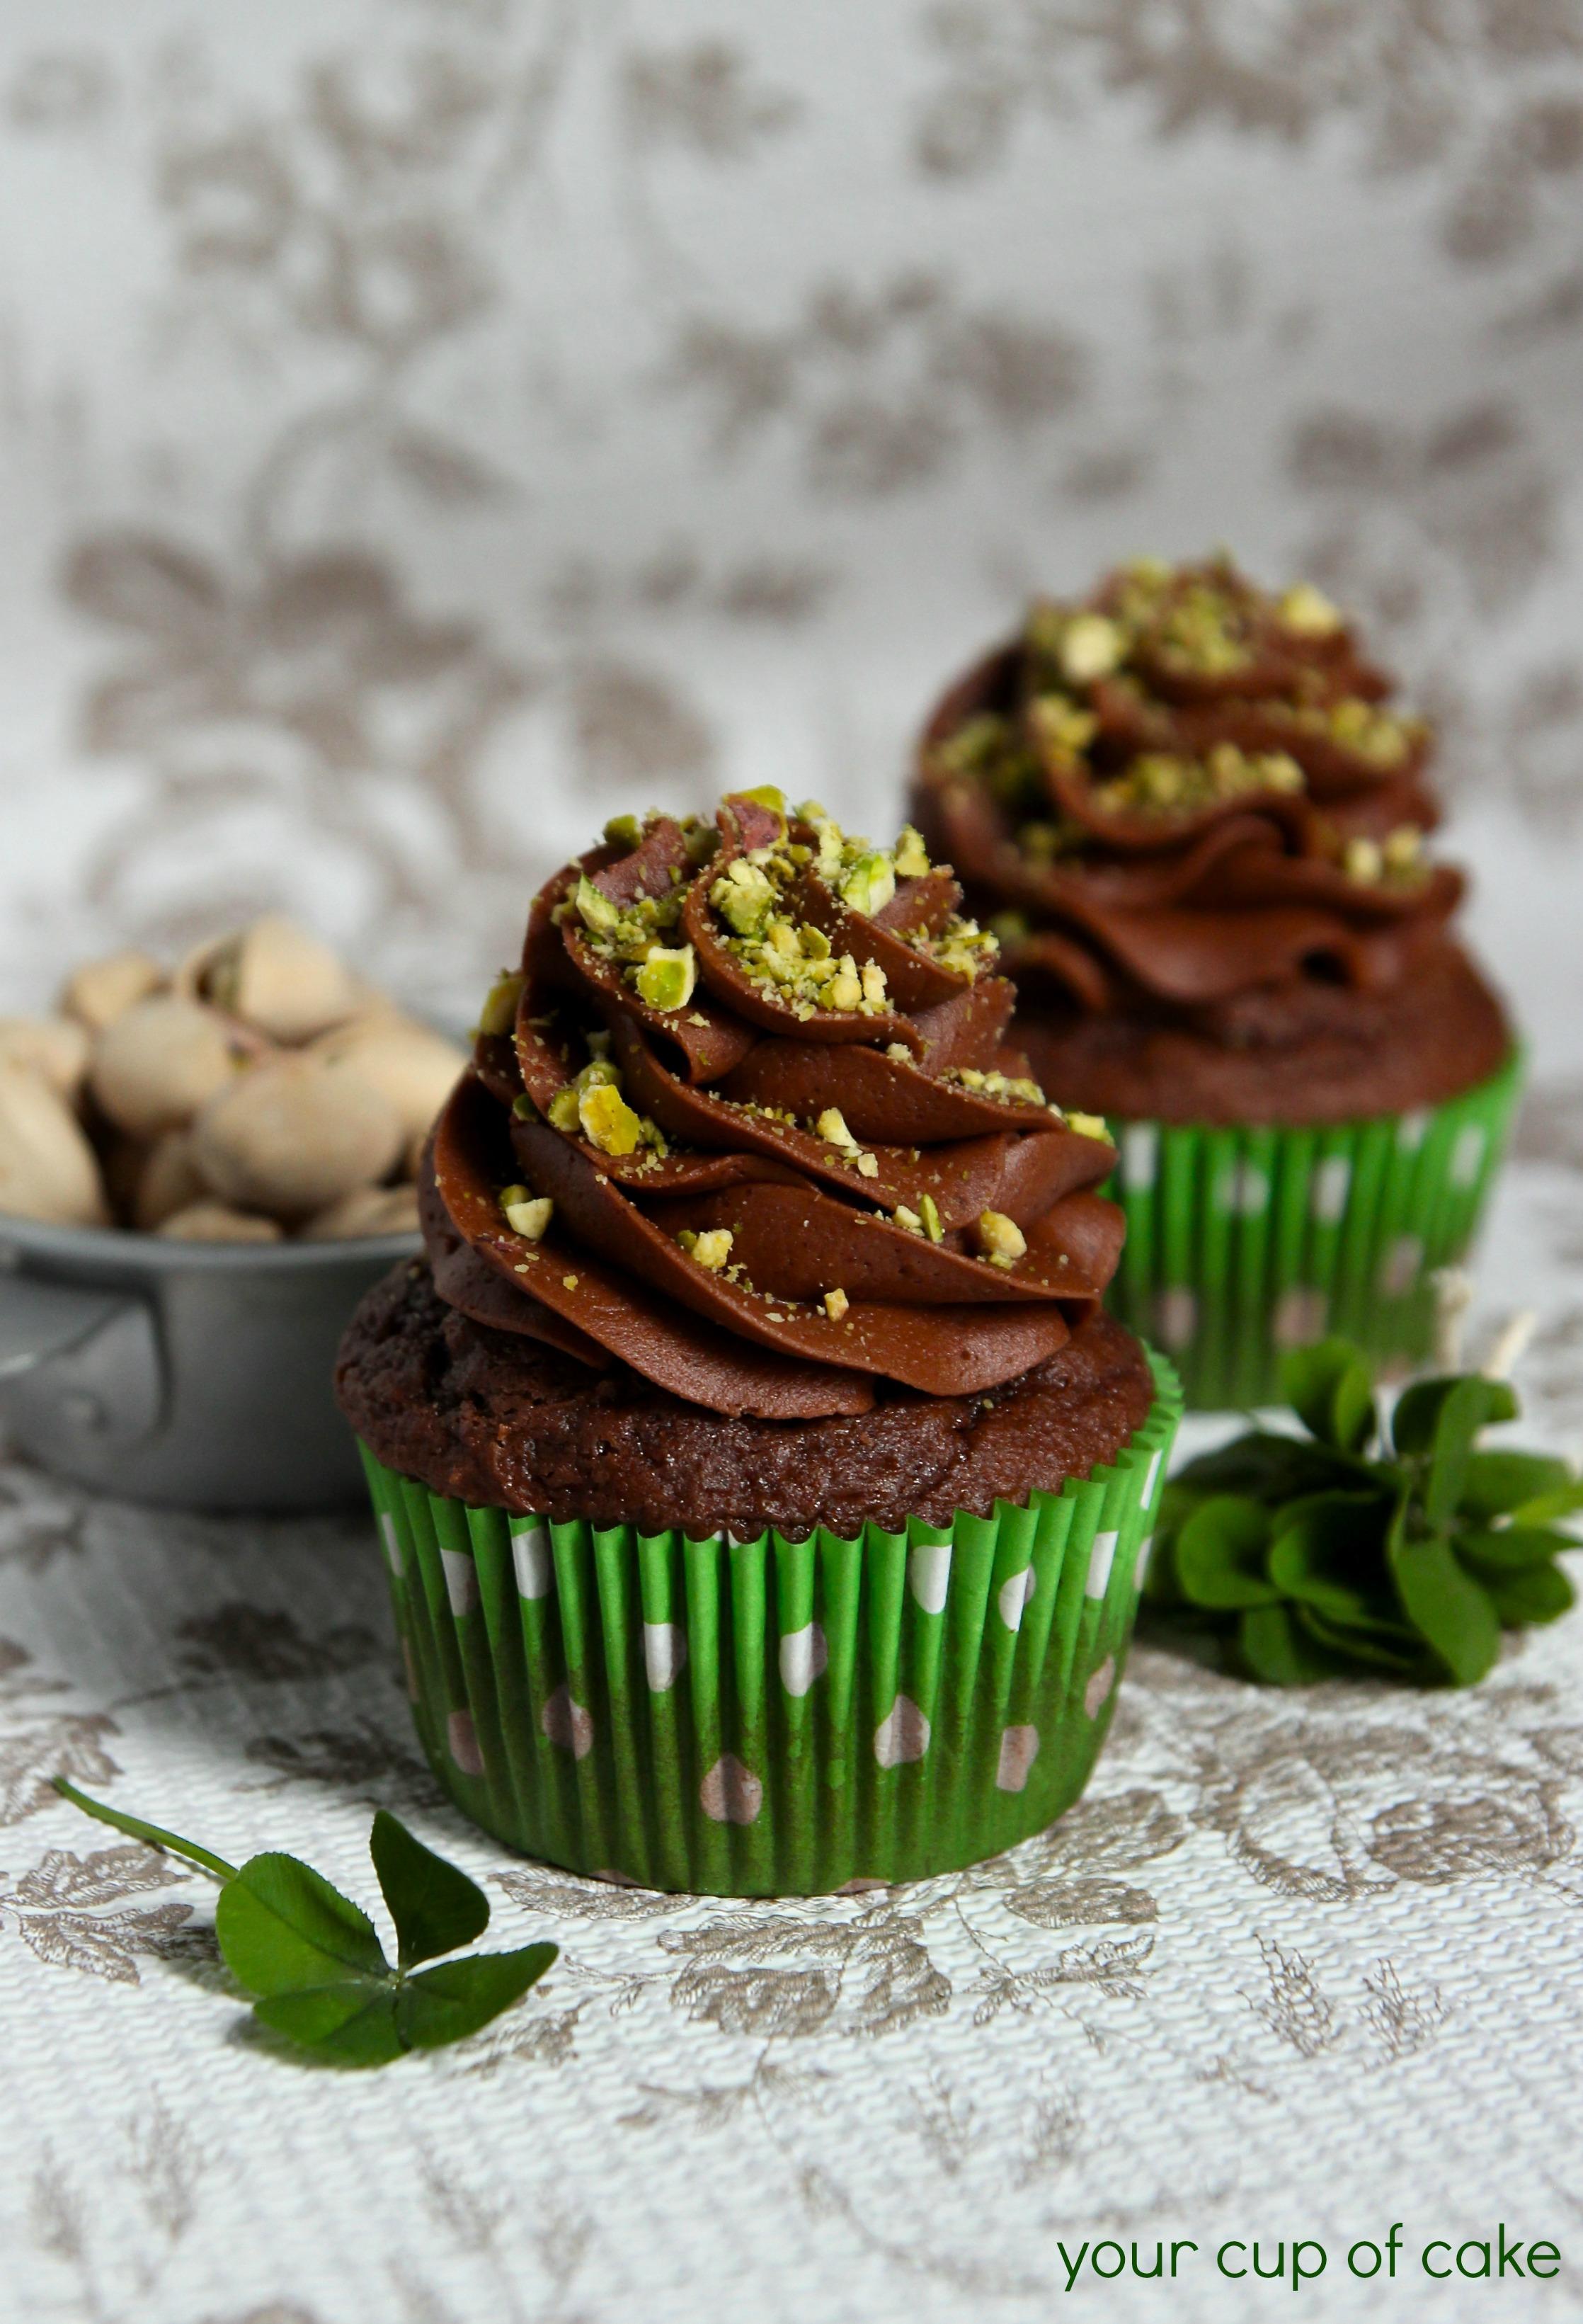 ... pistachio raspberry and pistachio pistachio cupcakes with pistachio